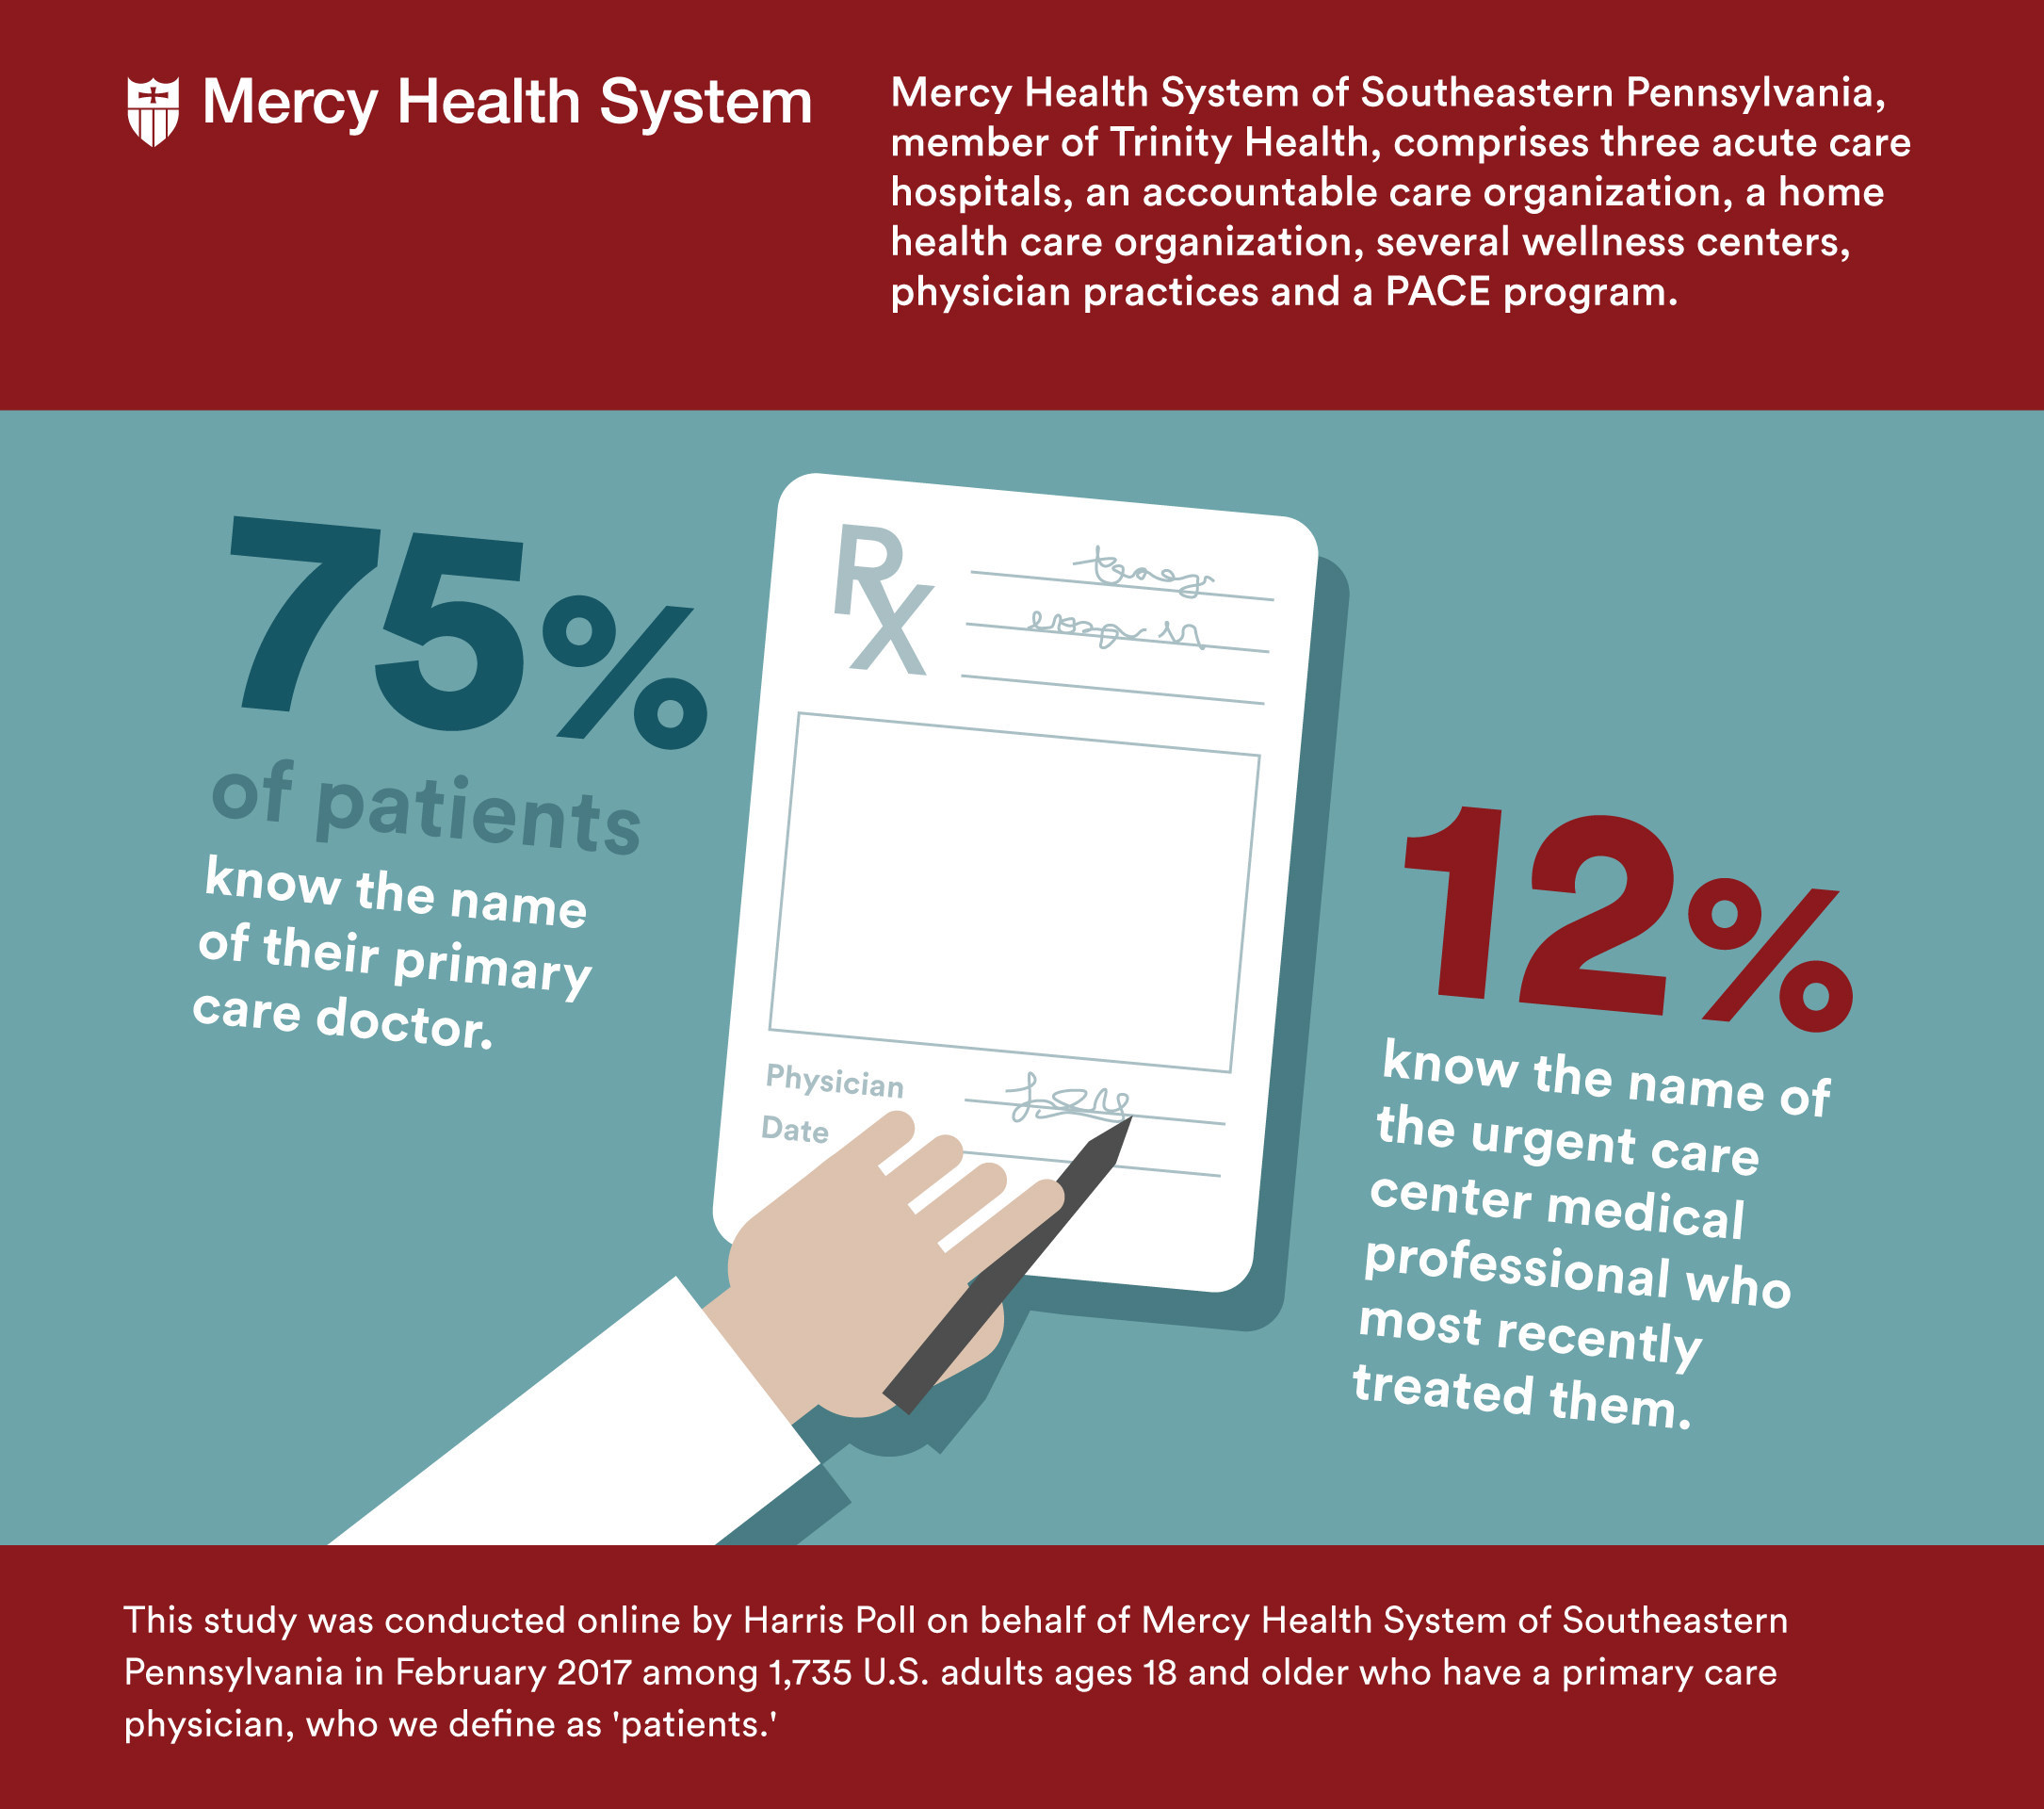 (PRNewsfoto/Mercy Health System of Southeas)